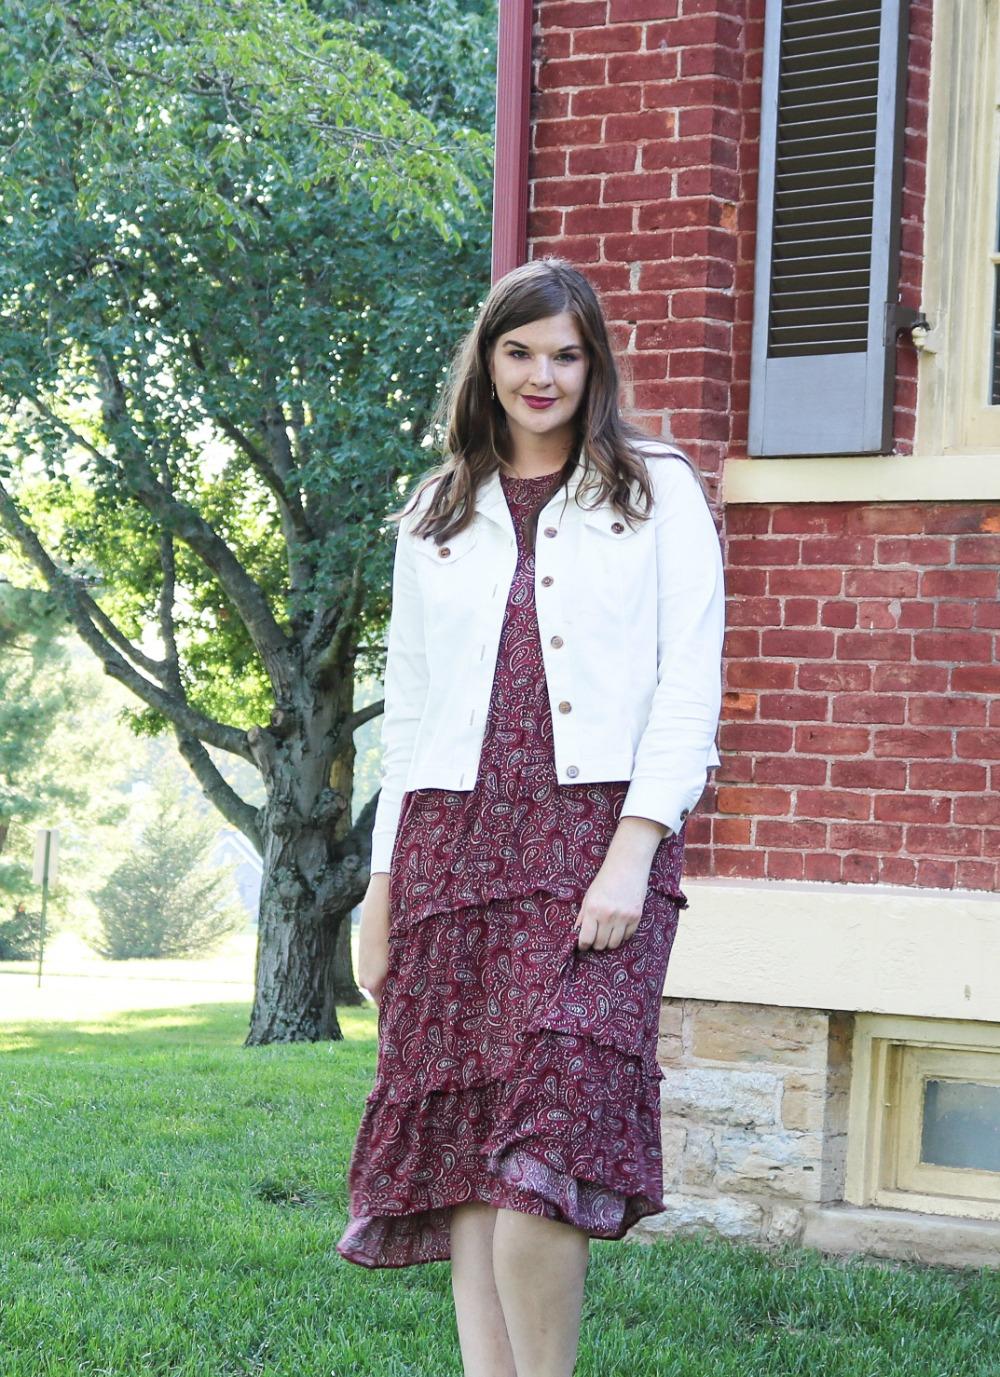 Transitional Fall Styles to Wear Now I Paisley Midi Dress with Jacket #fashionista #styleblog #styleblogger #fallfashion #fallstyleinspo